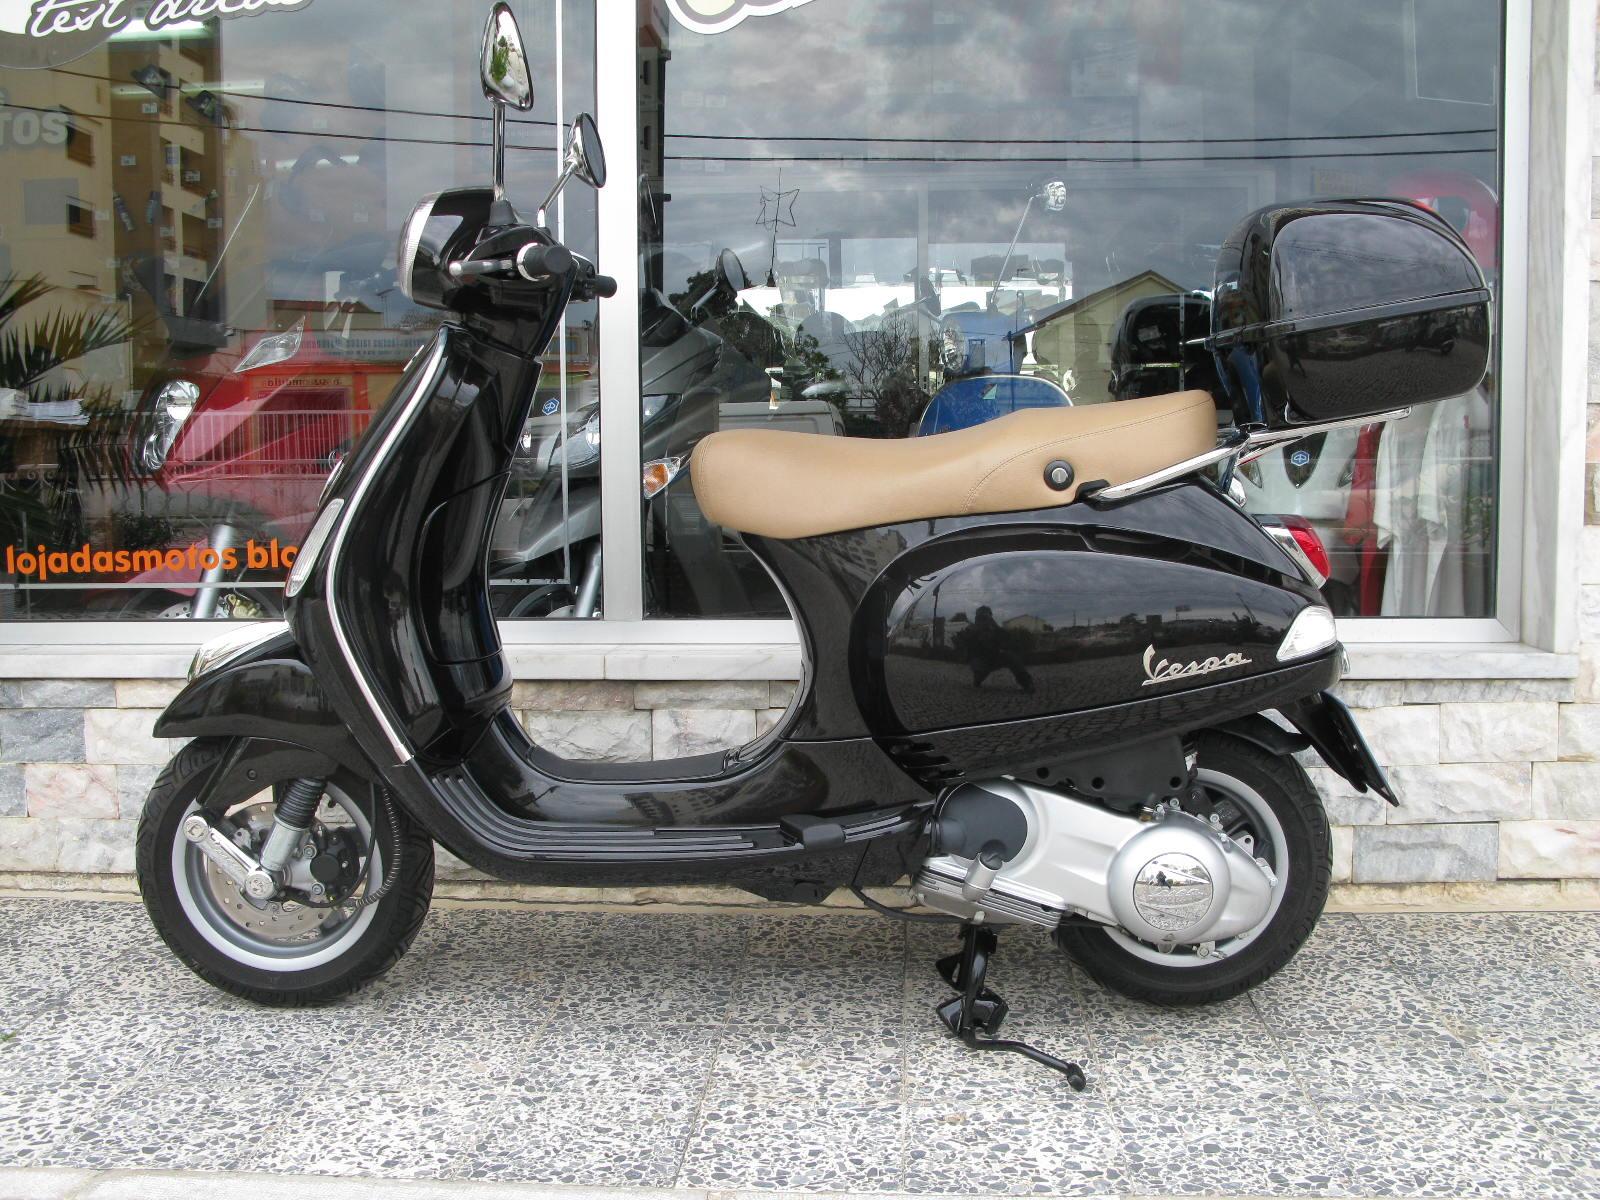 loja das motos vespa lx 125. Black Bedroom Furniture Sets. Home Design Ideas